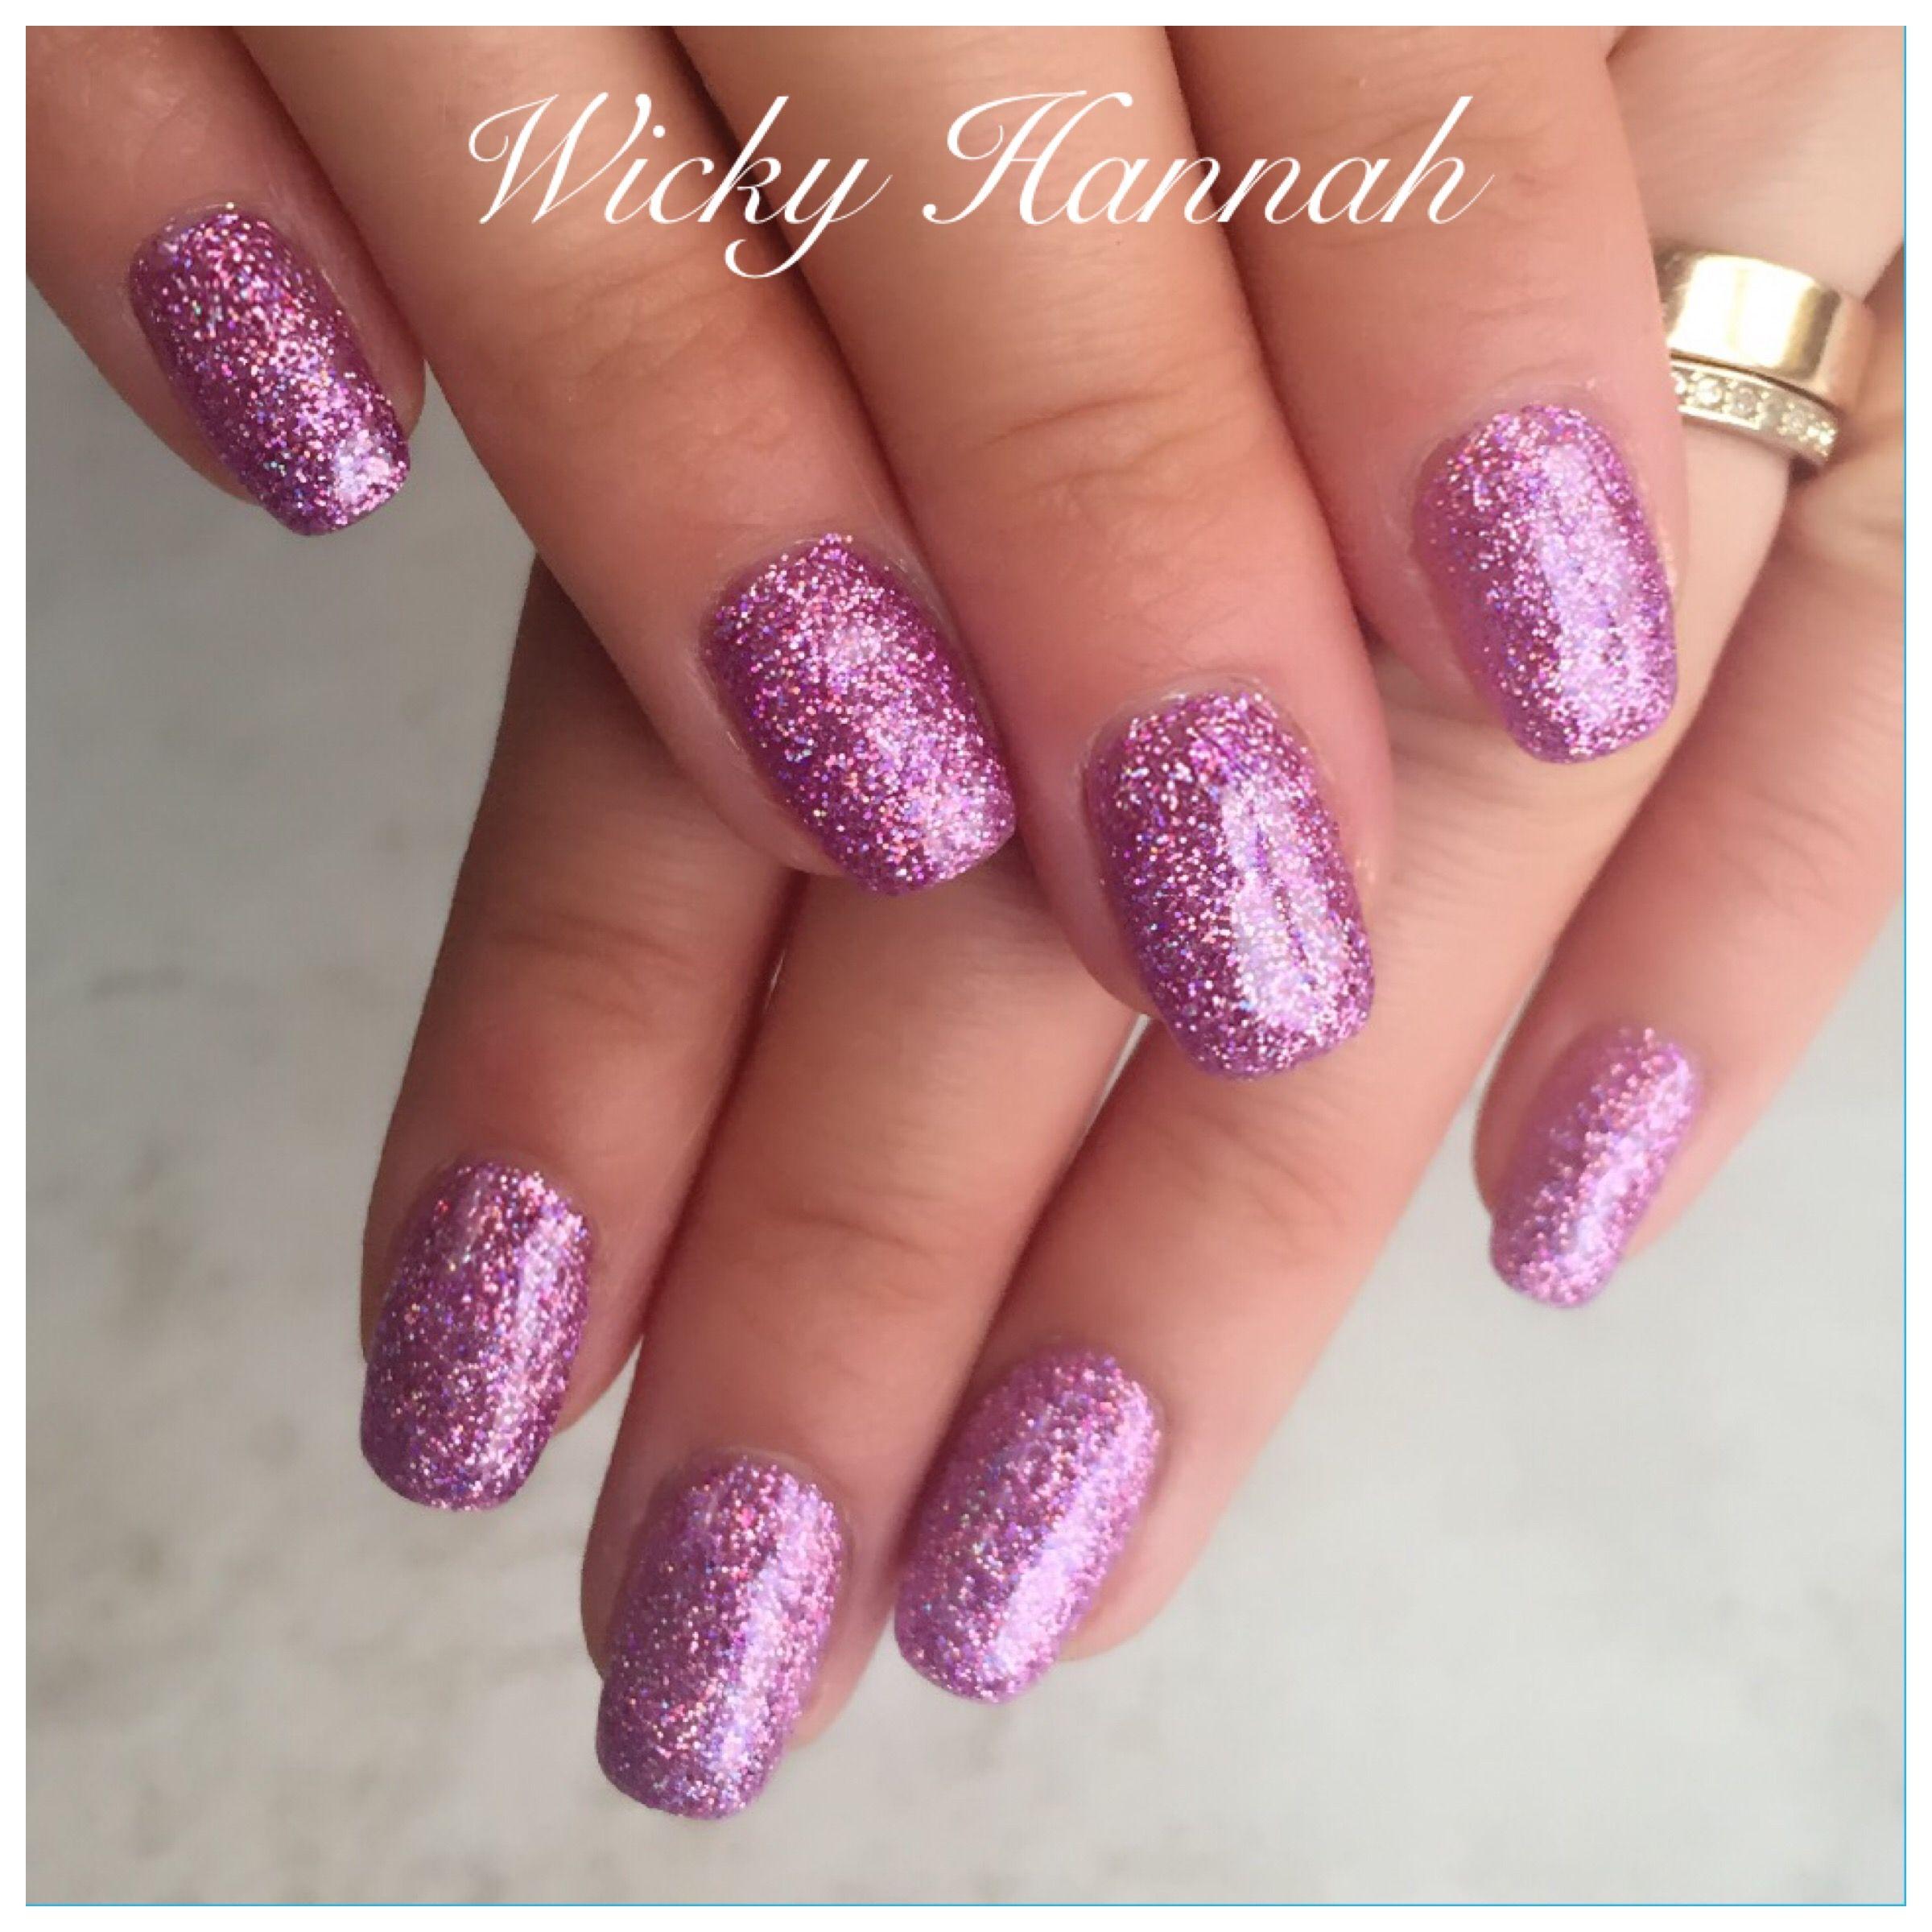 Holographic Purple Glitter Gel Polish   #wickyhannah #glittergelpolish #purpleglitter